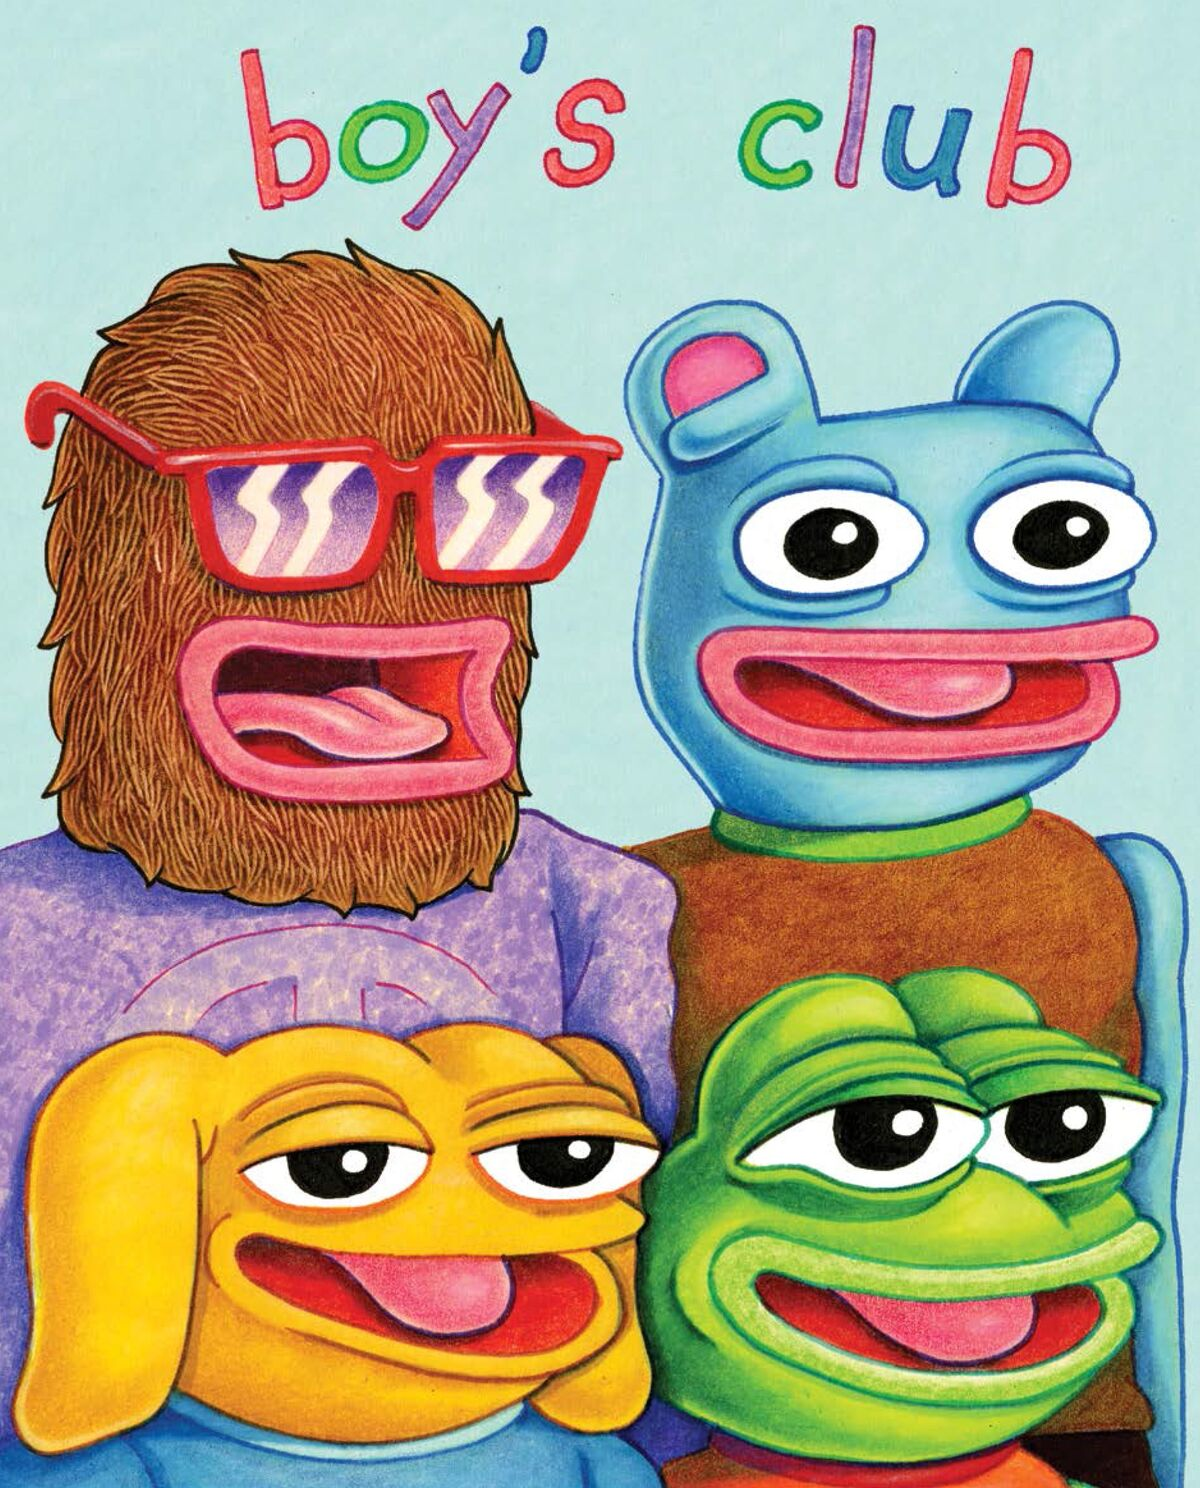 Matt Furie, Boy's Club, 2005. Courtesy of Fantagraphics Books, Inc.